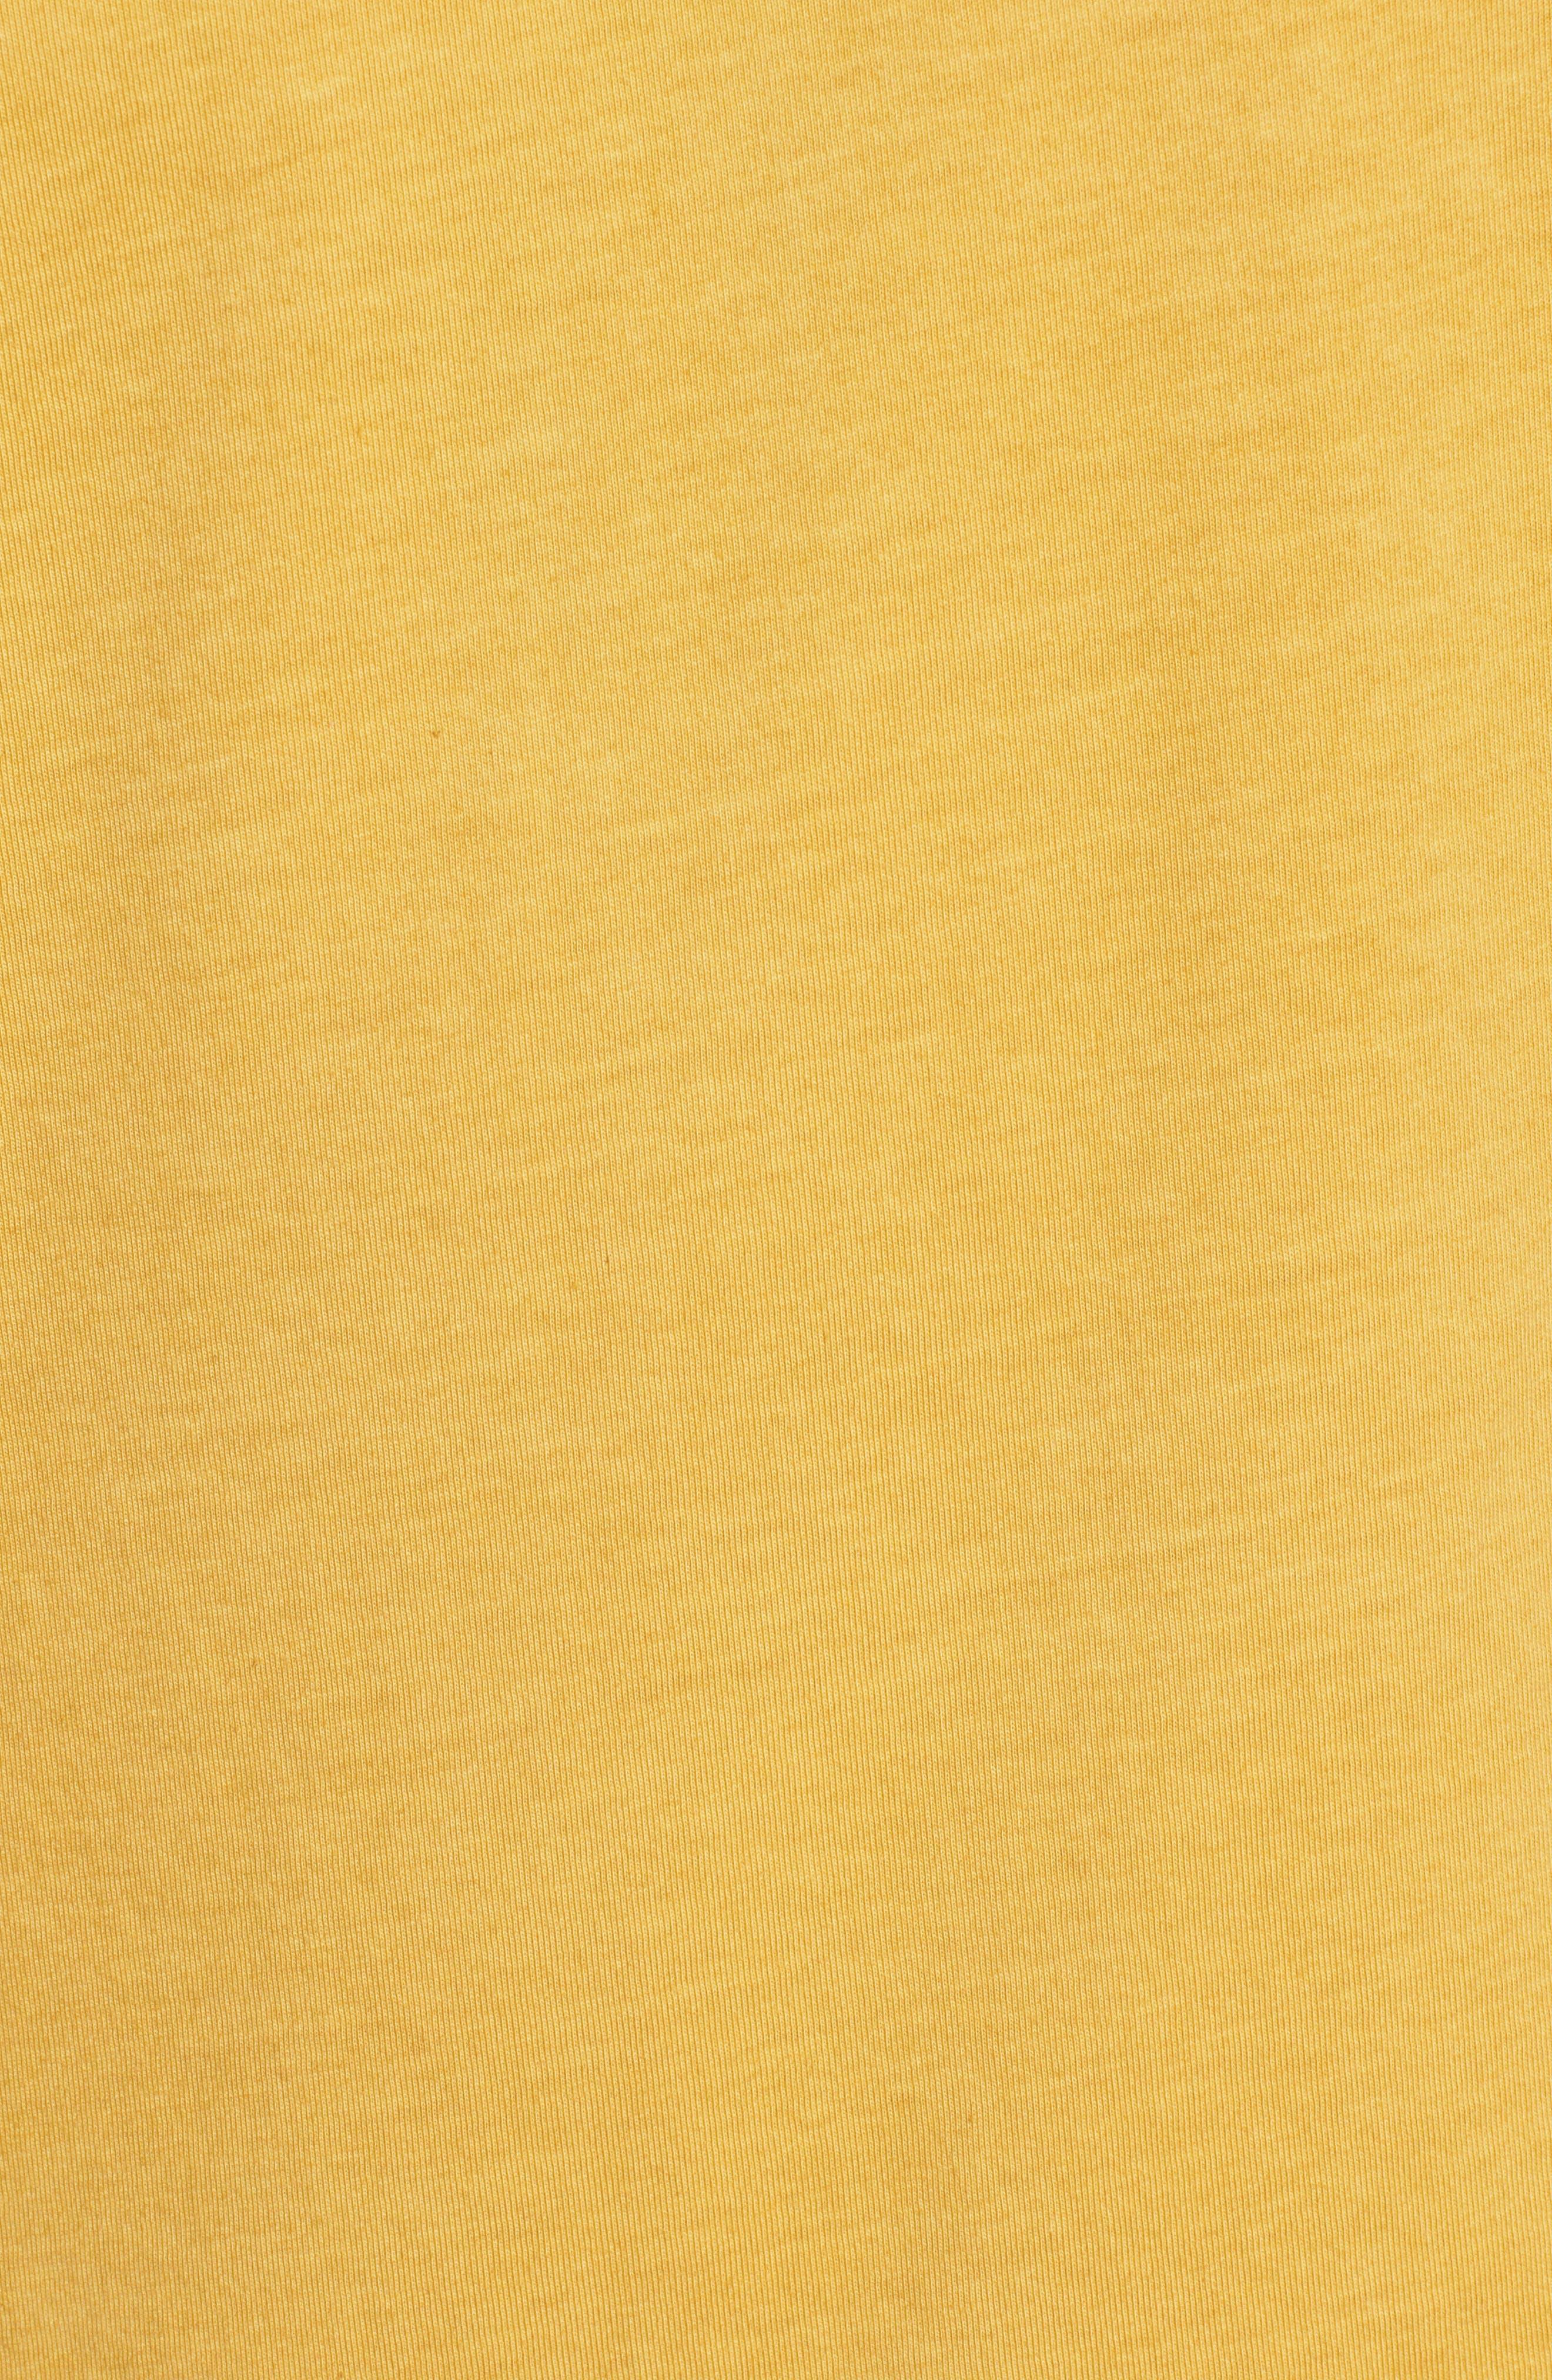 Reid T-Shirt,                             Alternate thumbnail 5, color,                             LEMON